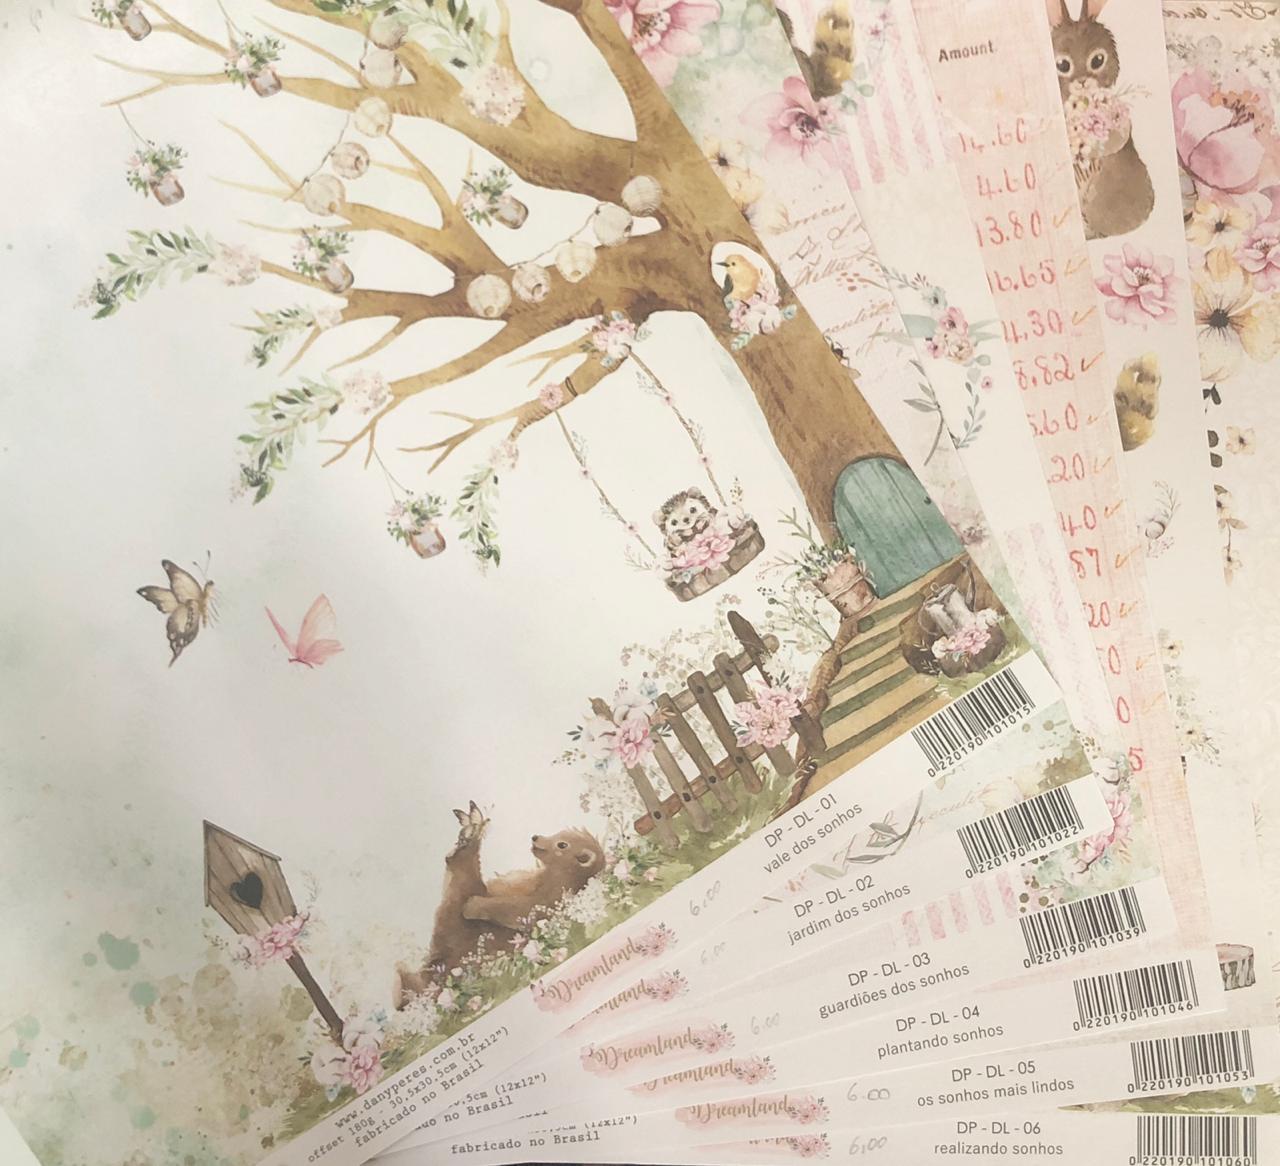 Kit Papéis Coleção Dreamland (6 Papéis)  - Dany Peres